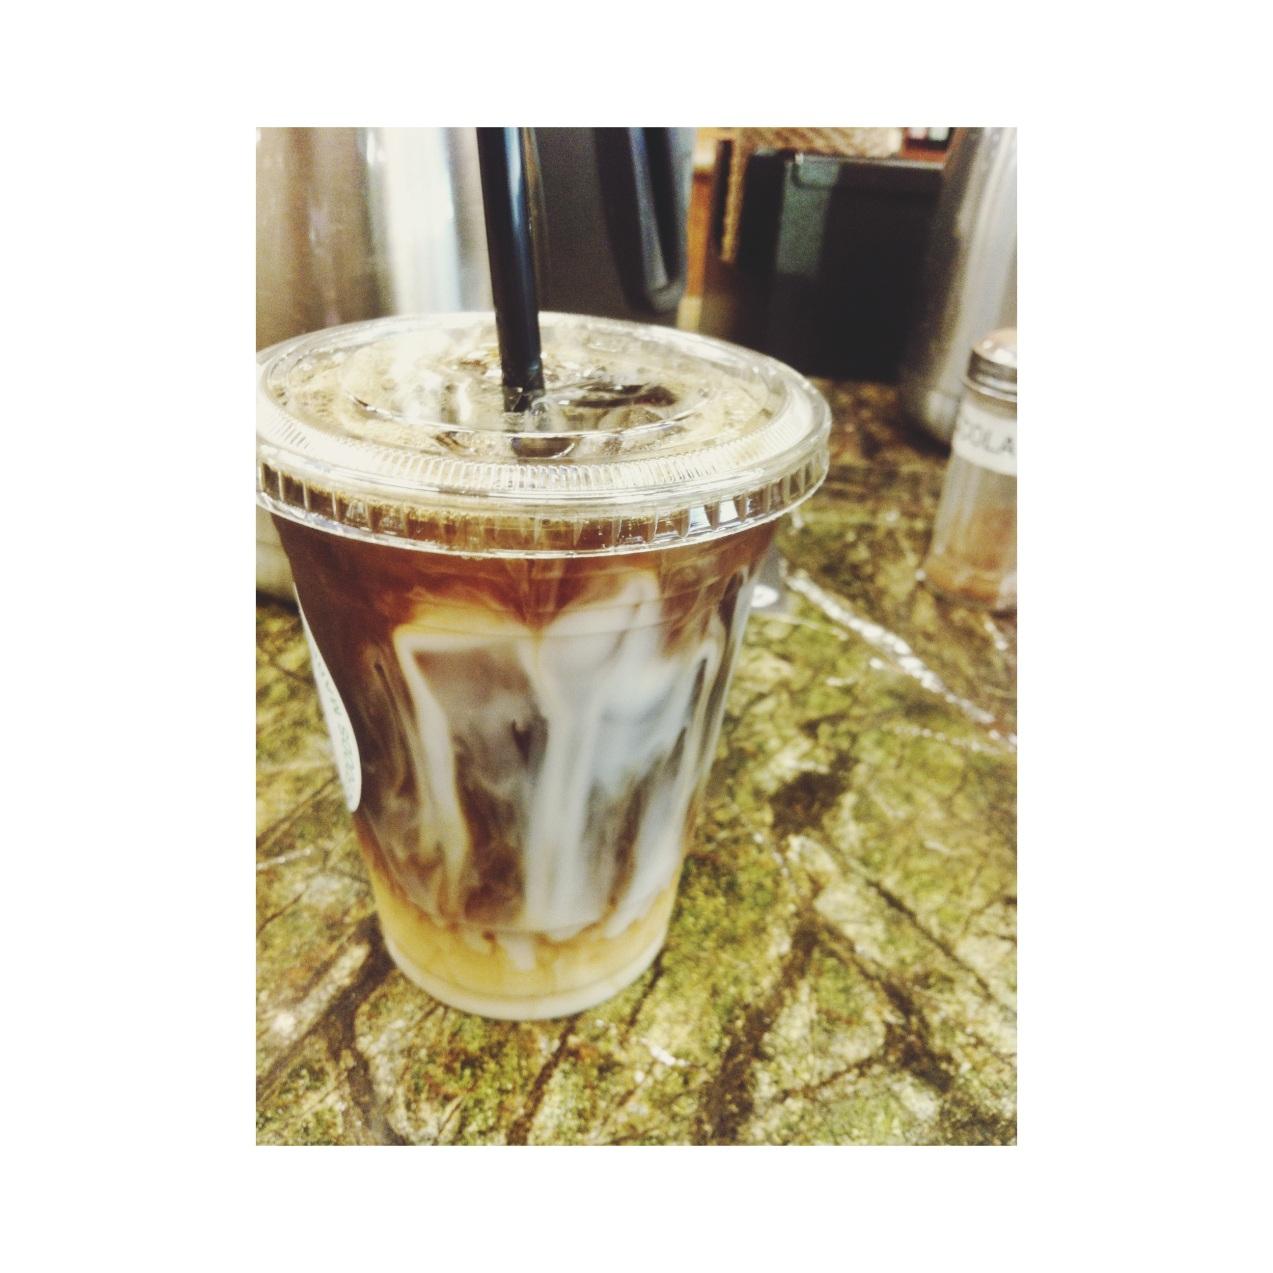 Iced Coffee + Almond Milk @ Whole Foods